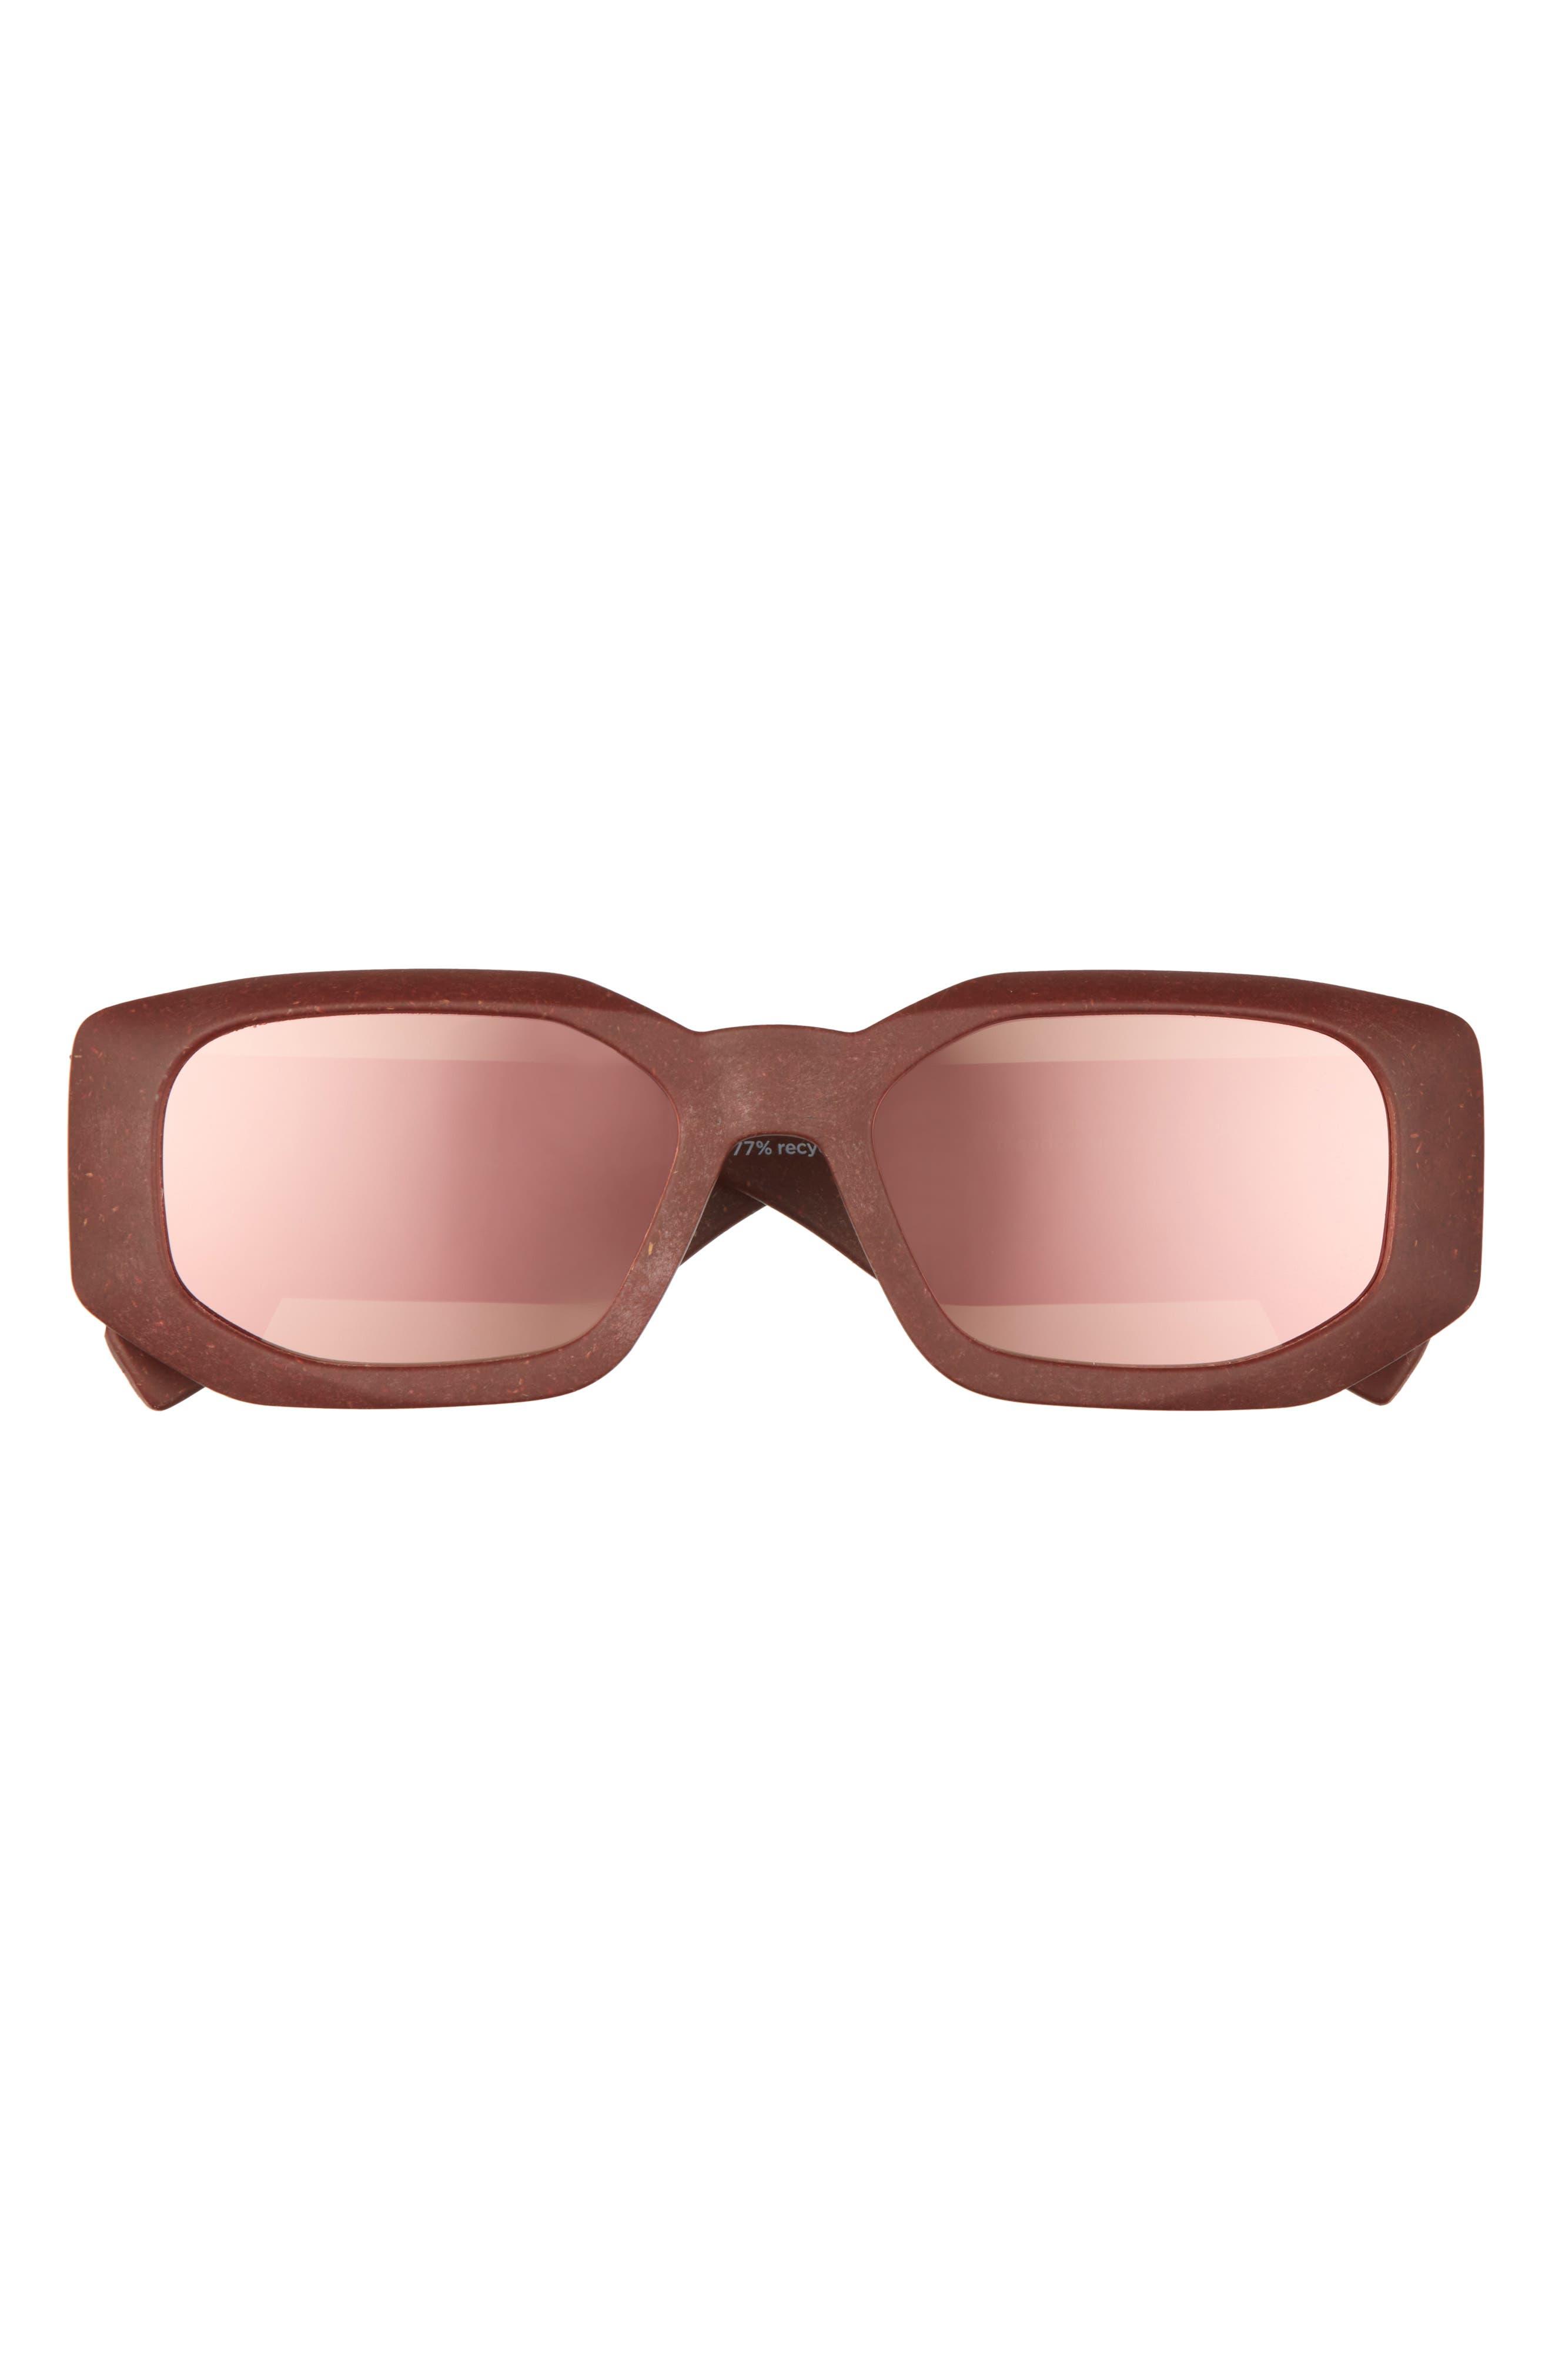 Glass Half Full 54mm Rectangular Sunglasses